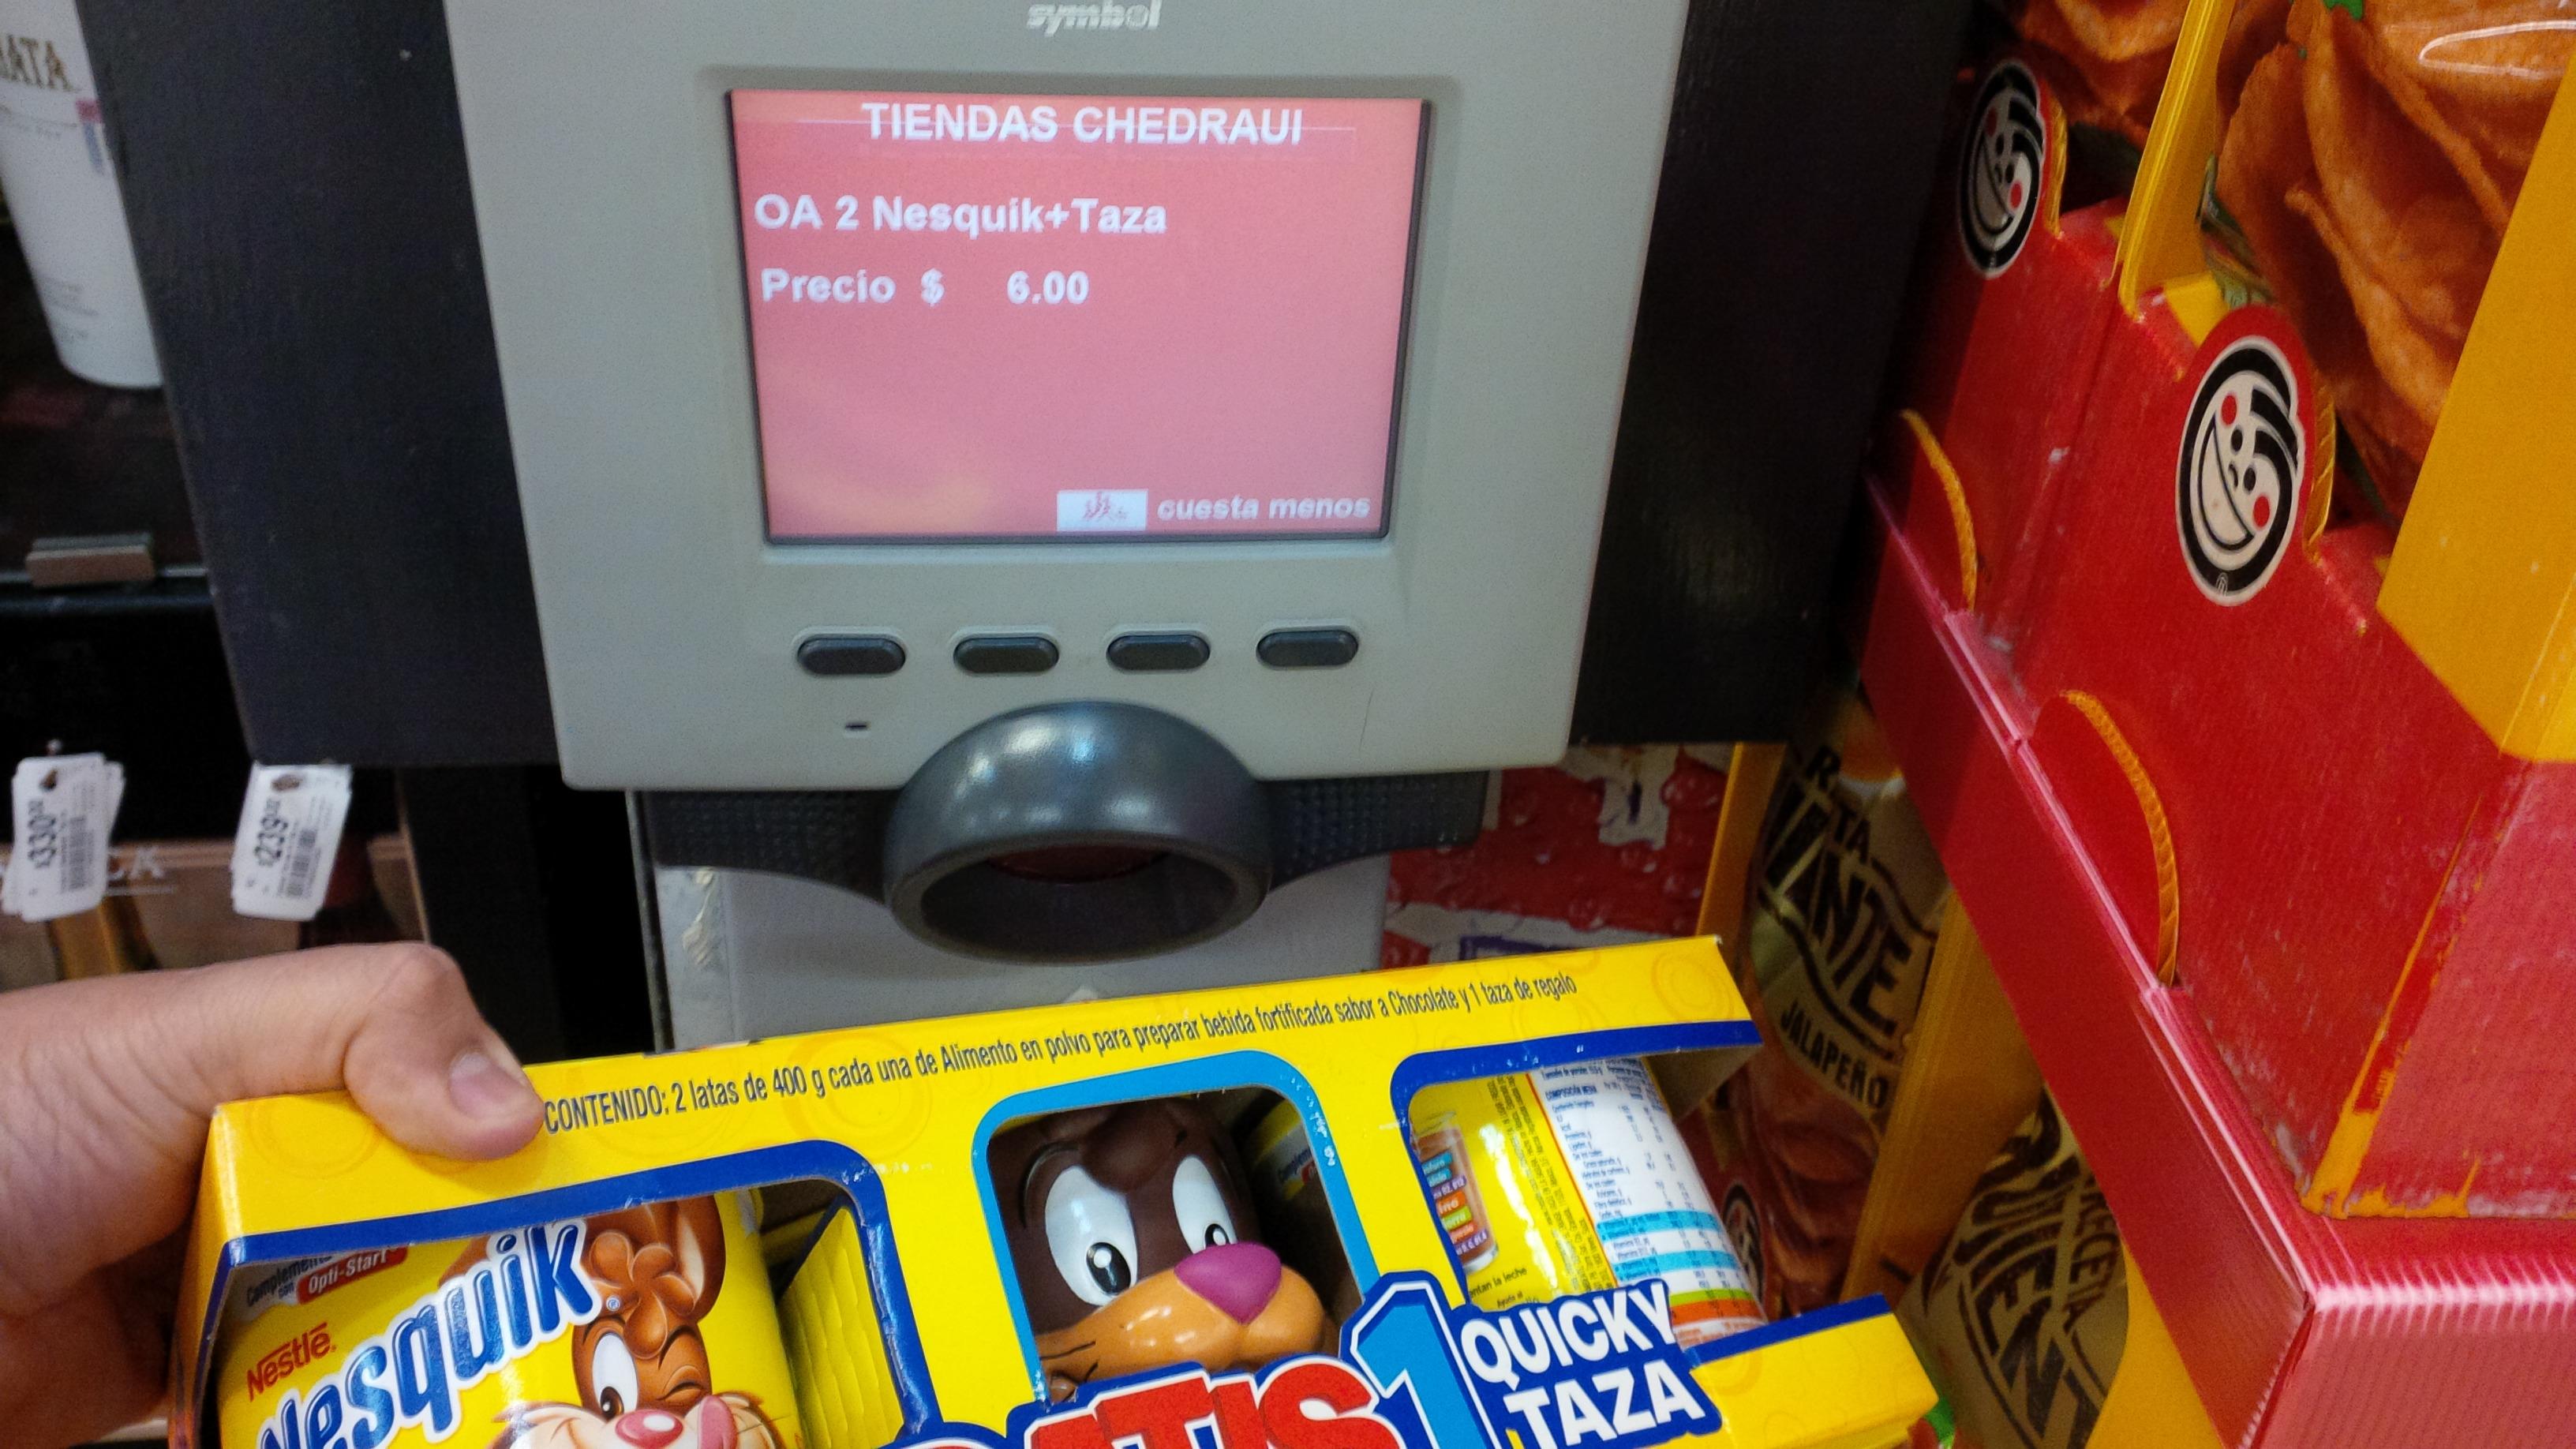 Chedraui: pack de 2 latas de Nesquik de 400gr mas taza a $6